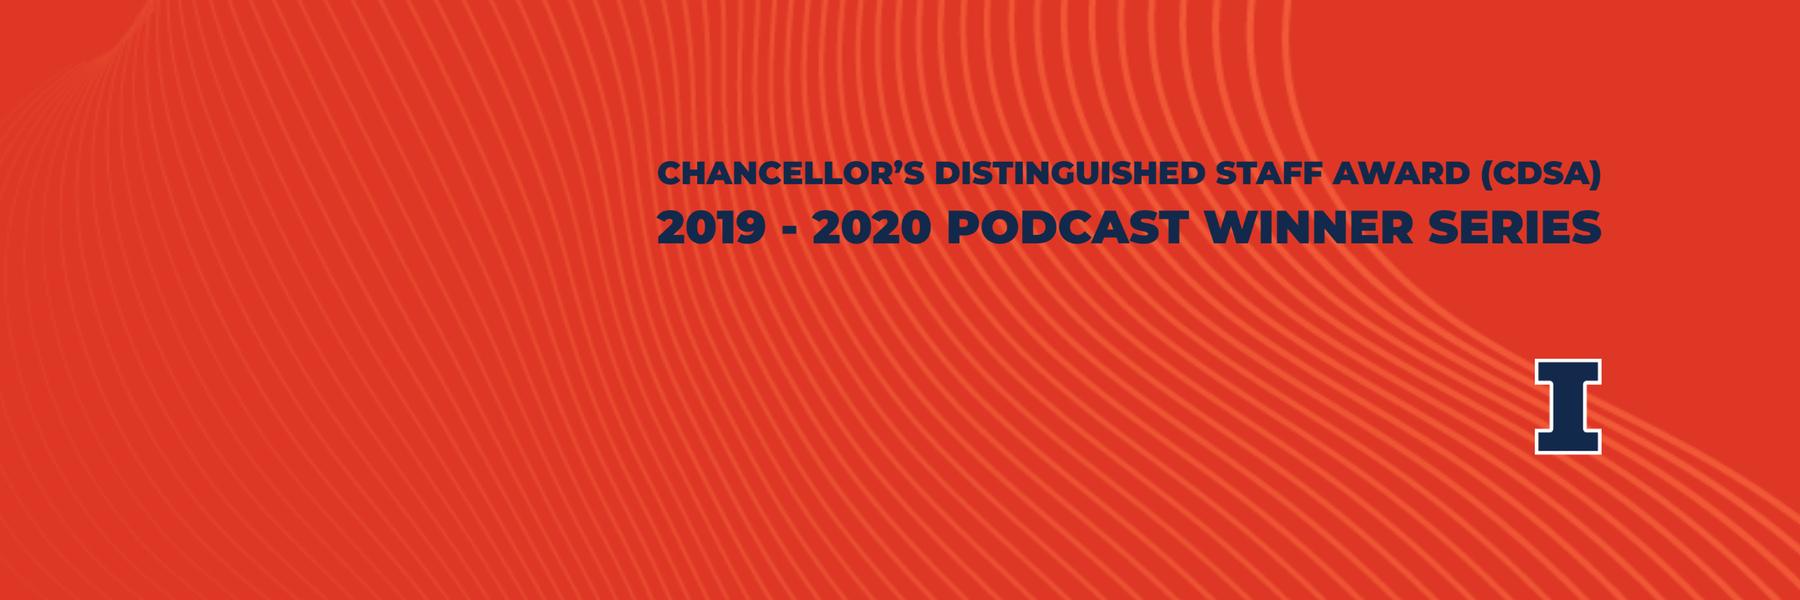 Banner of CDSA Award Podcast Series